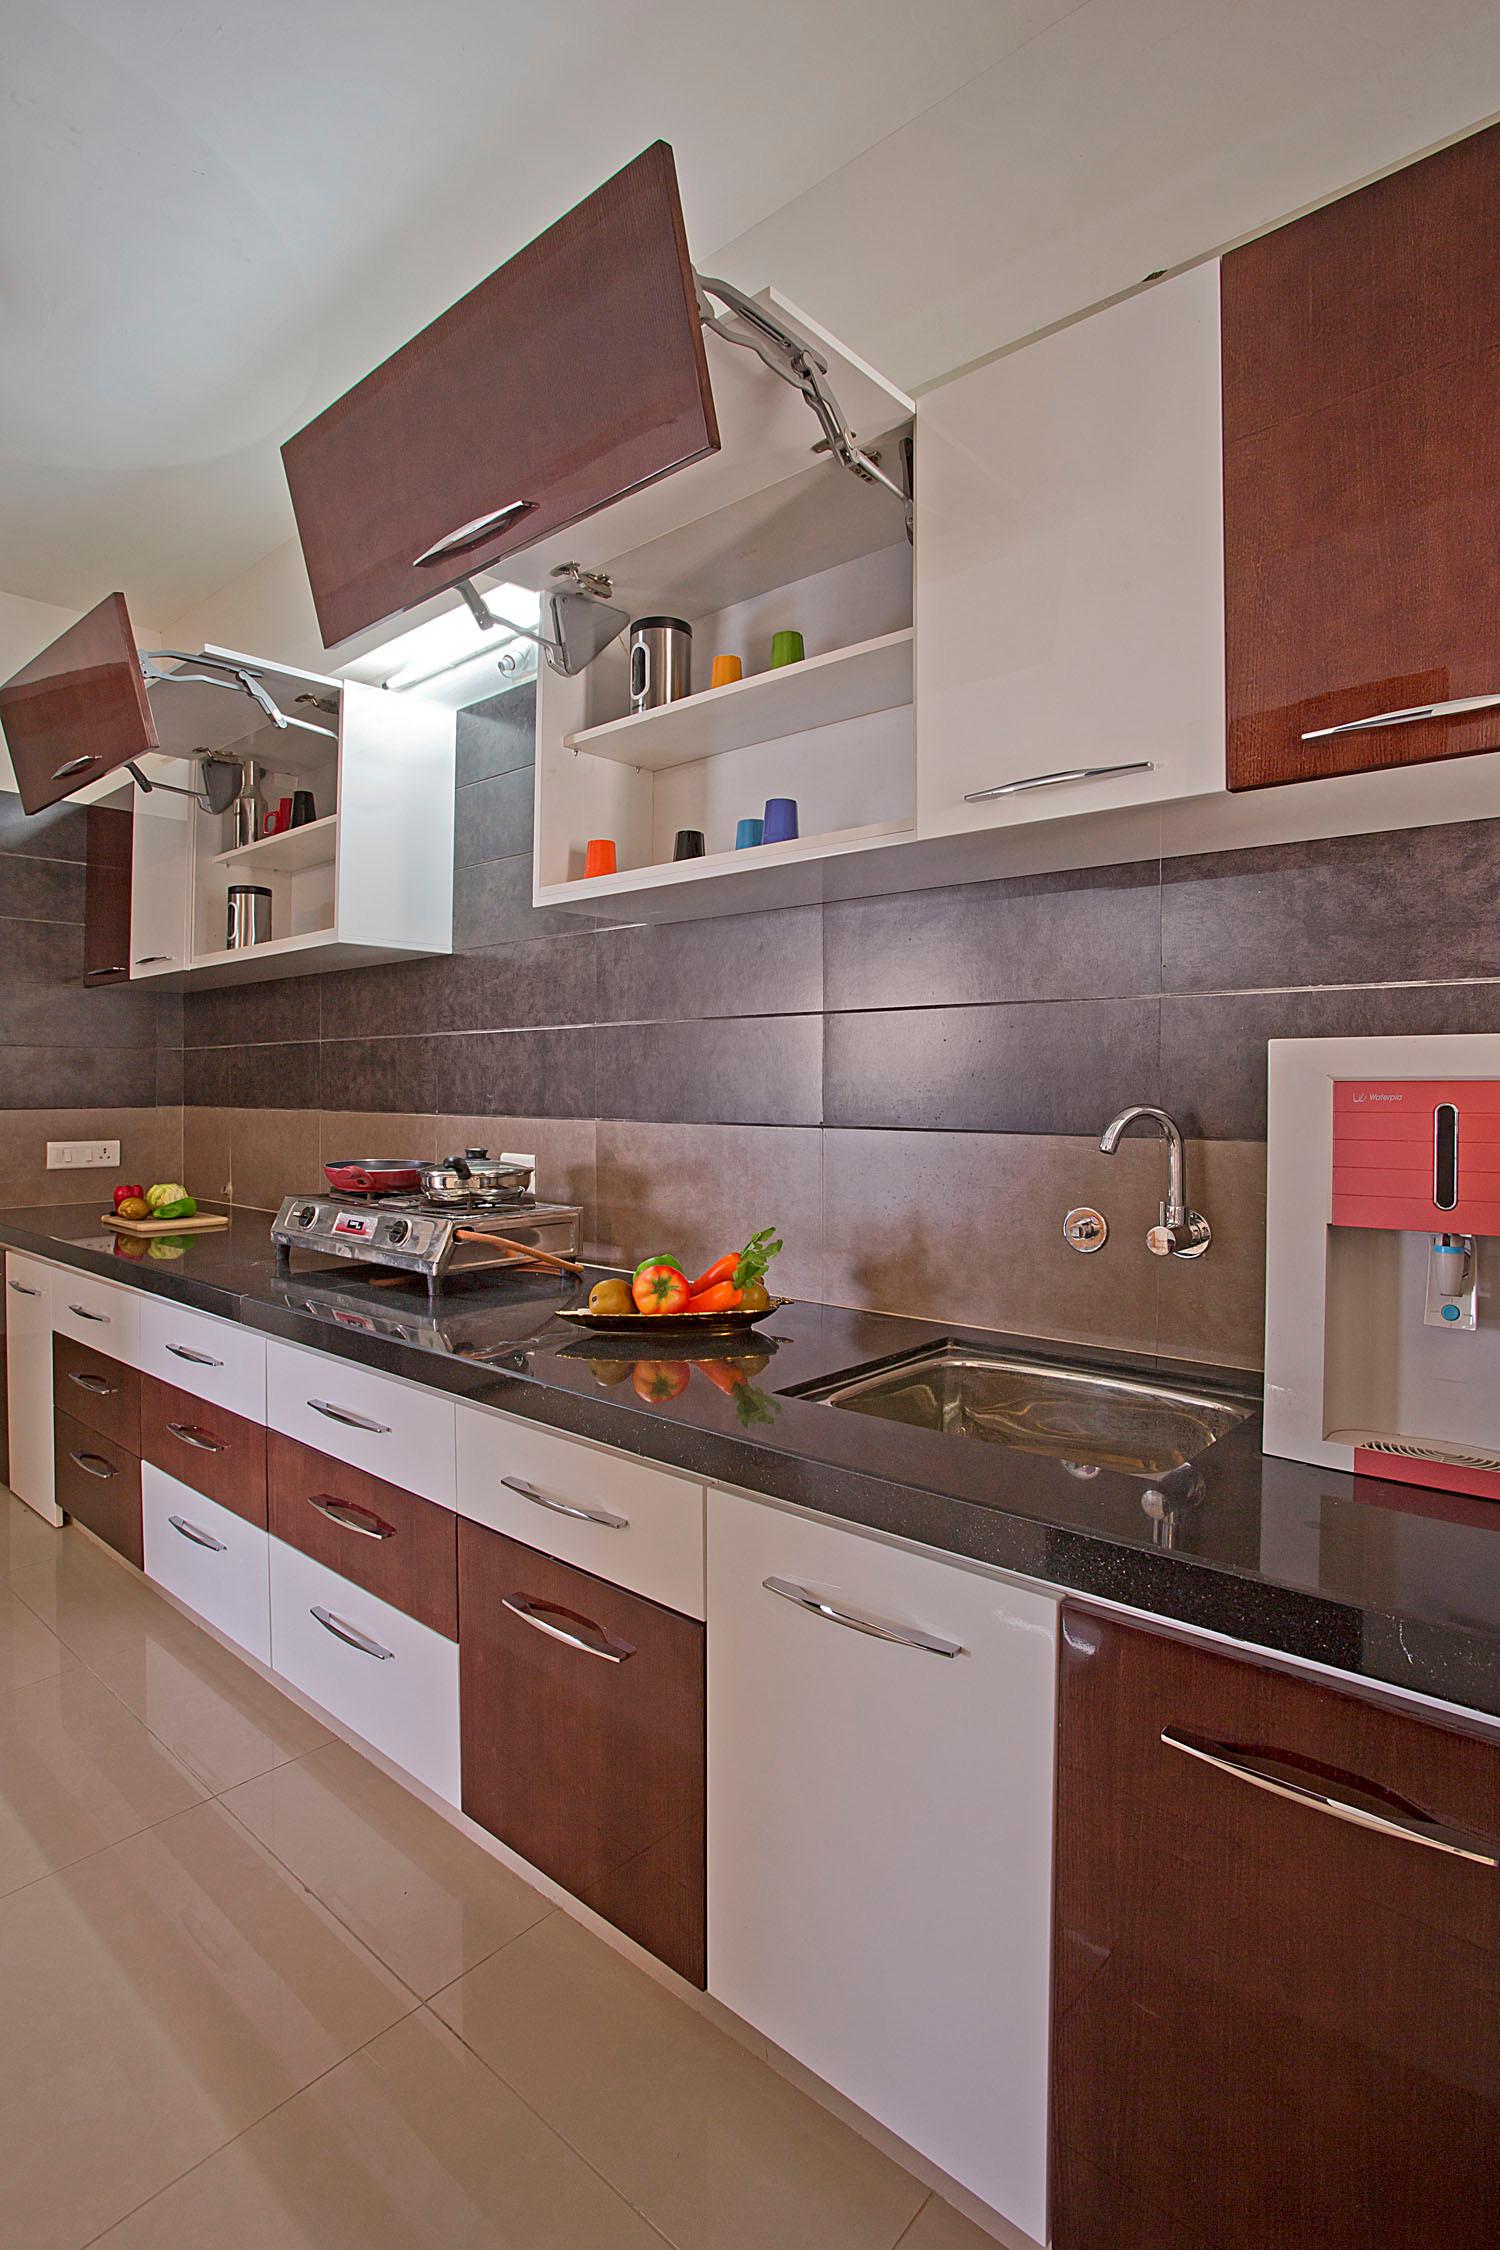 Indian Kitchen Design Ideas Inspiration Images August 2021 Houzz In